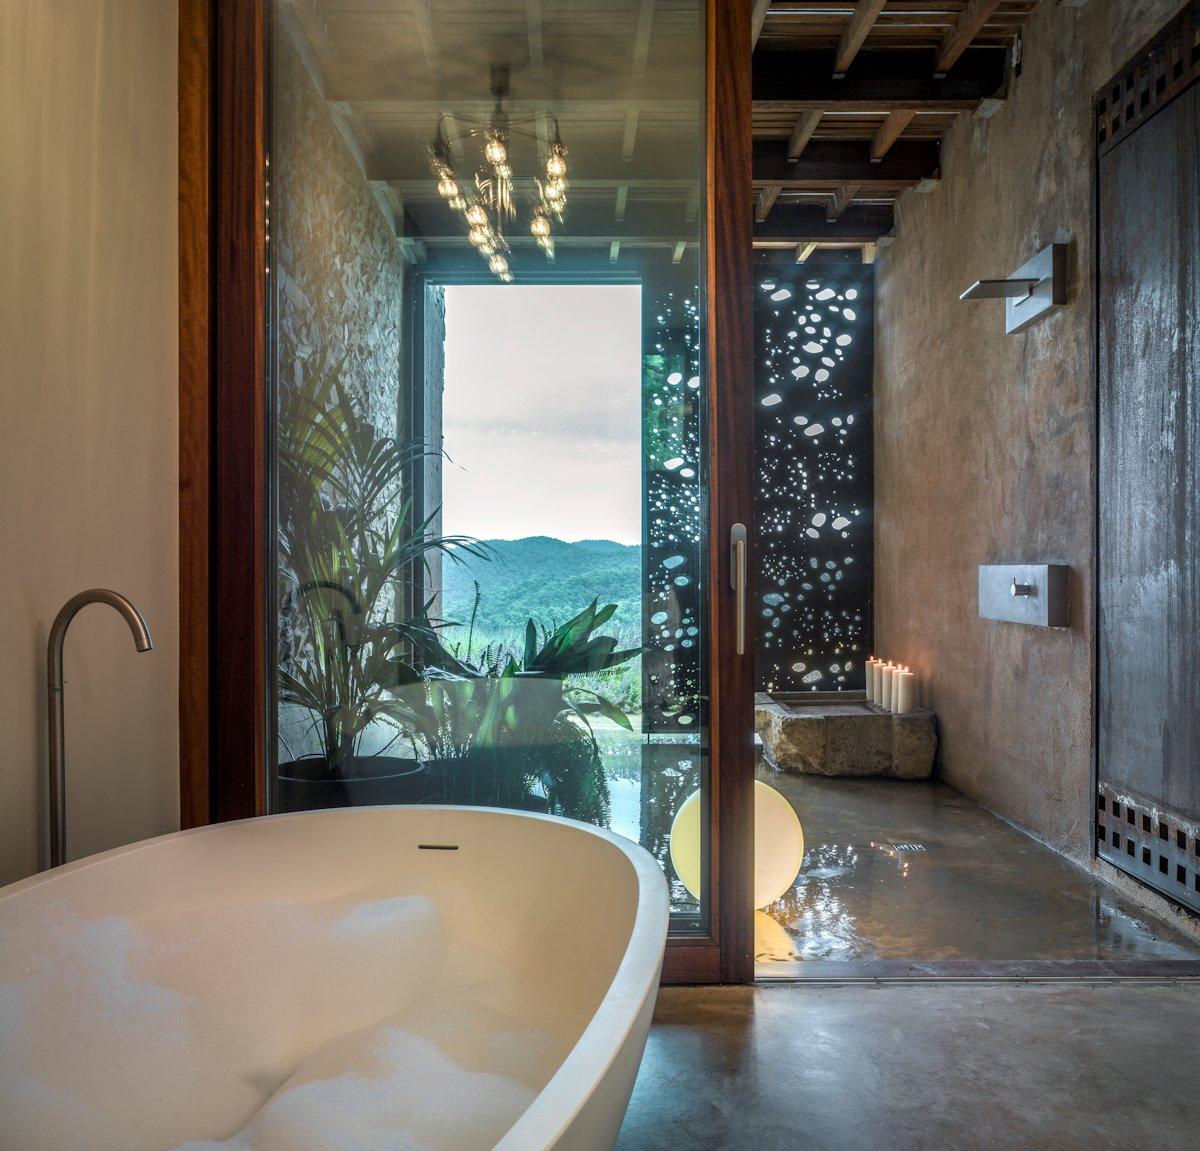 Bath, Rustic Bathroom, Catalan Farmhouse, Girona, Spain